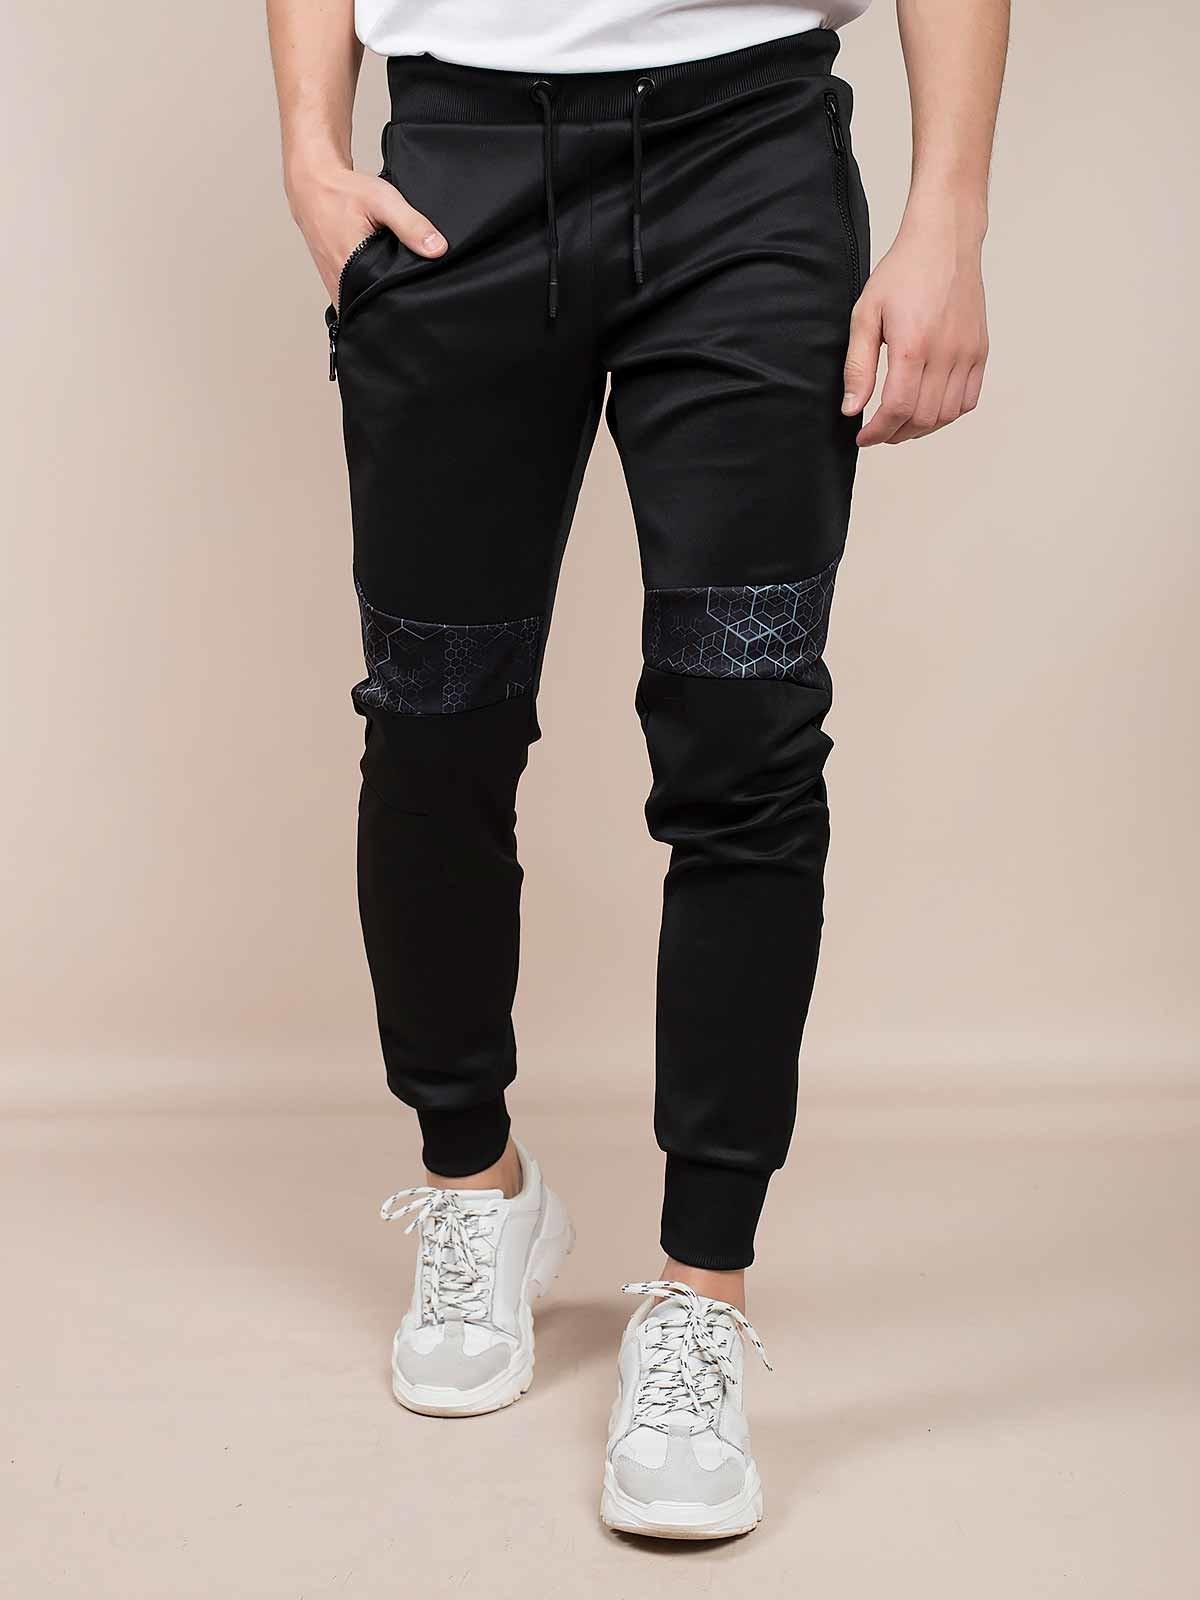 Pantalones deportivos negros